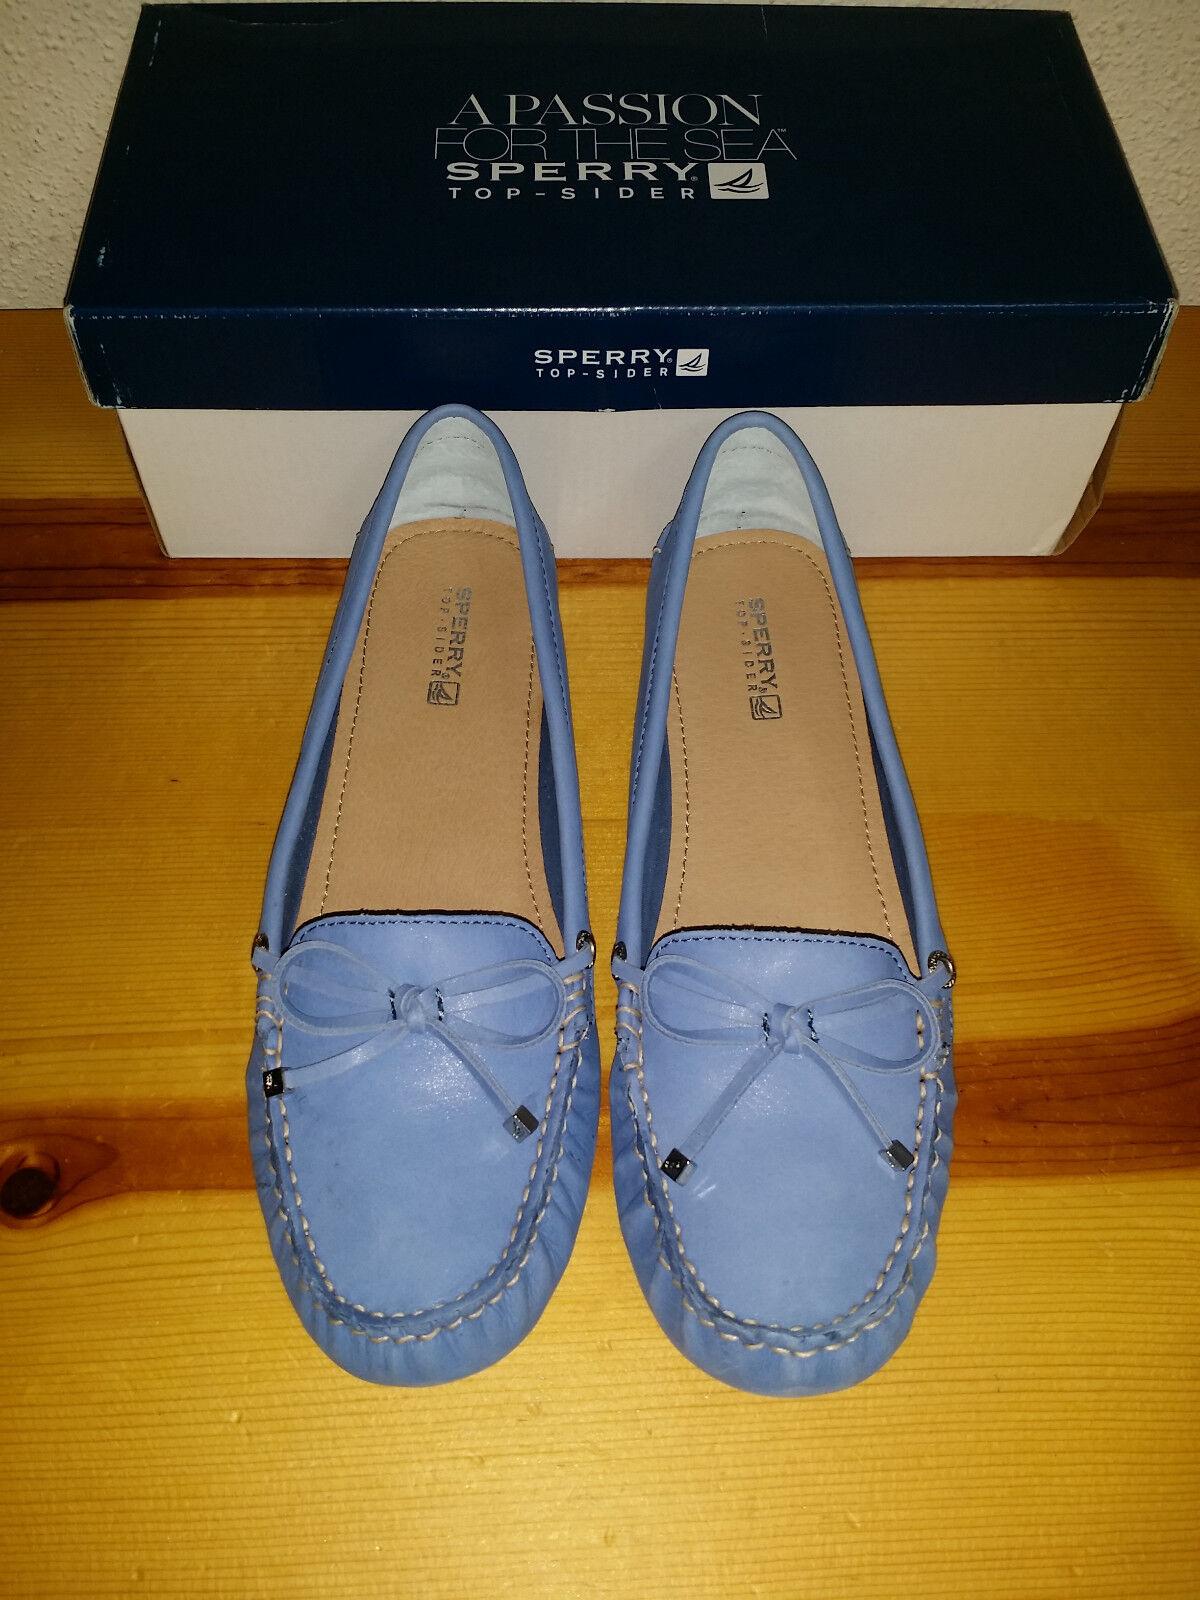 90 para mujer 9.5 Sperry Top-Sider Katharine Katharine Katharine Brillos Zapatos Náuticos Azul  precios bajos